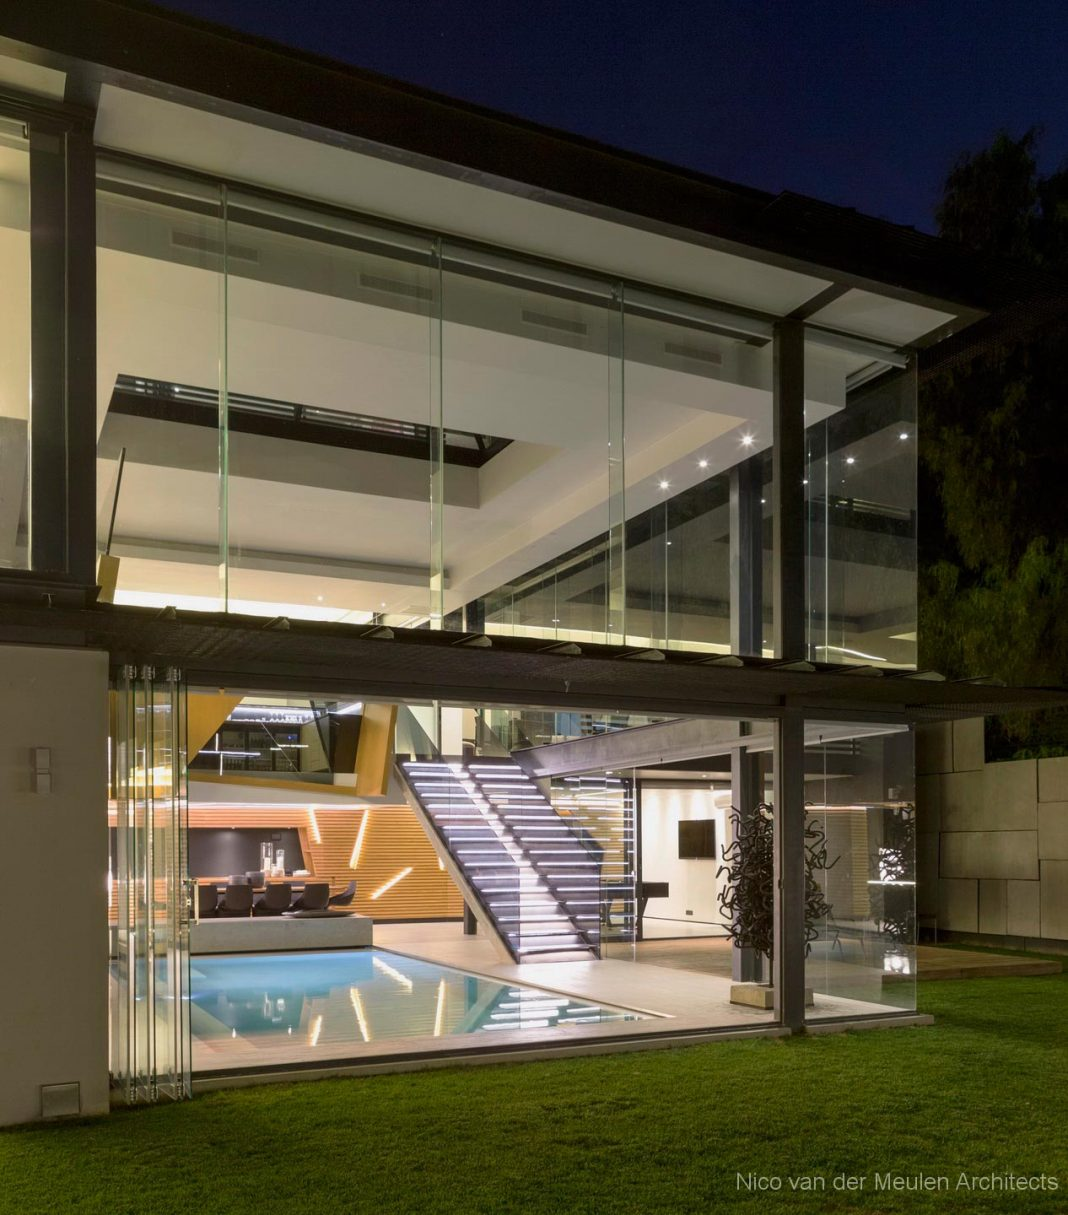 The Concrete House Masterpiece By Nico Van Der Meulen